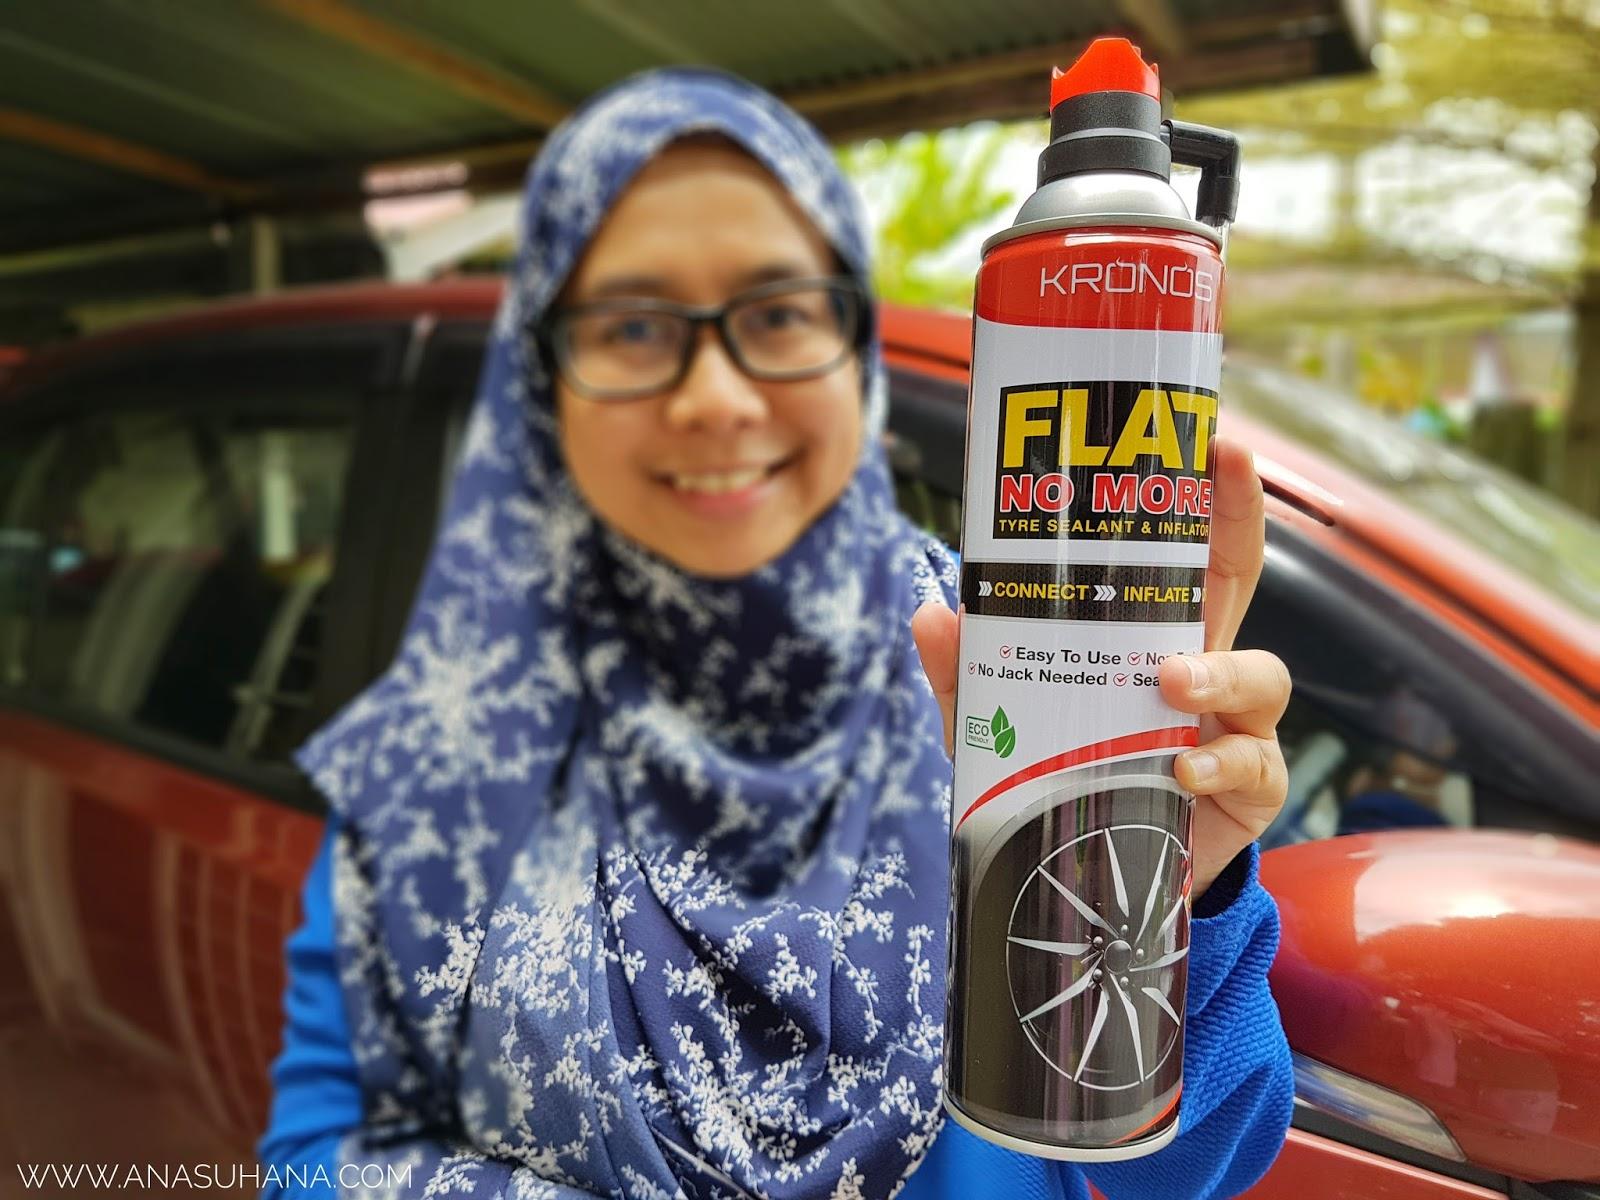 KRONOS FLATNOMORE Tyre Sealant & Inflator